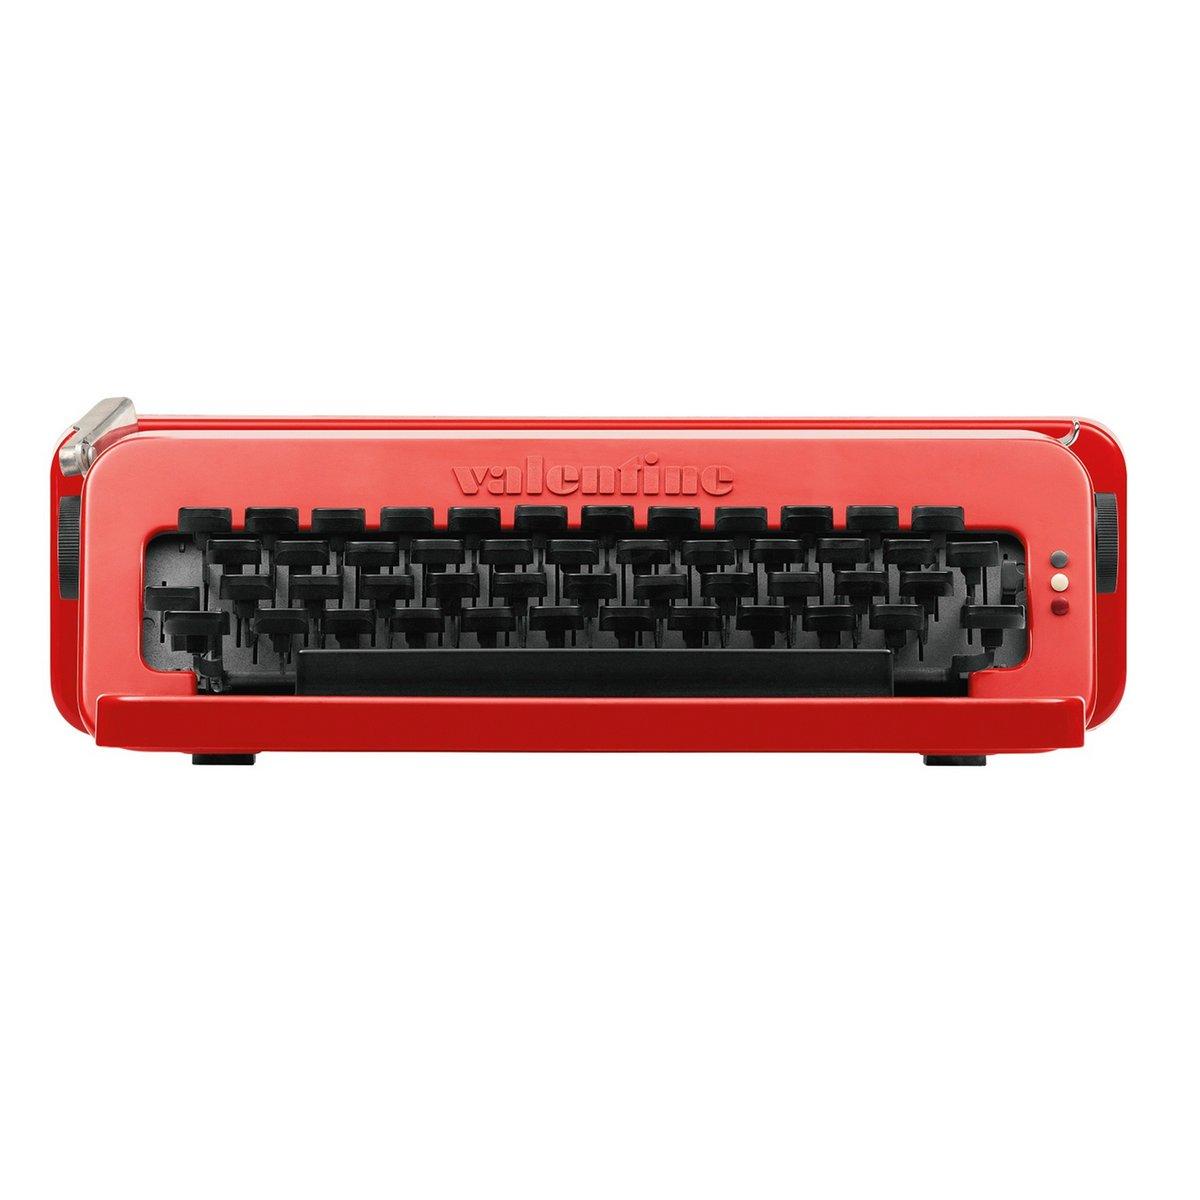 Vintage Portable Valentine Typewriter By Ettore Sottsass